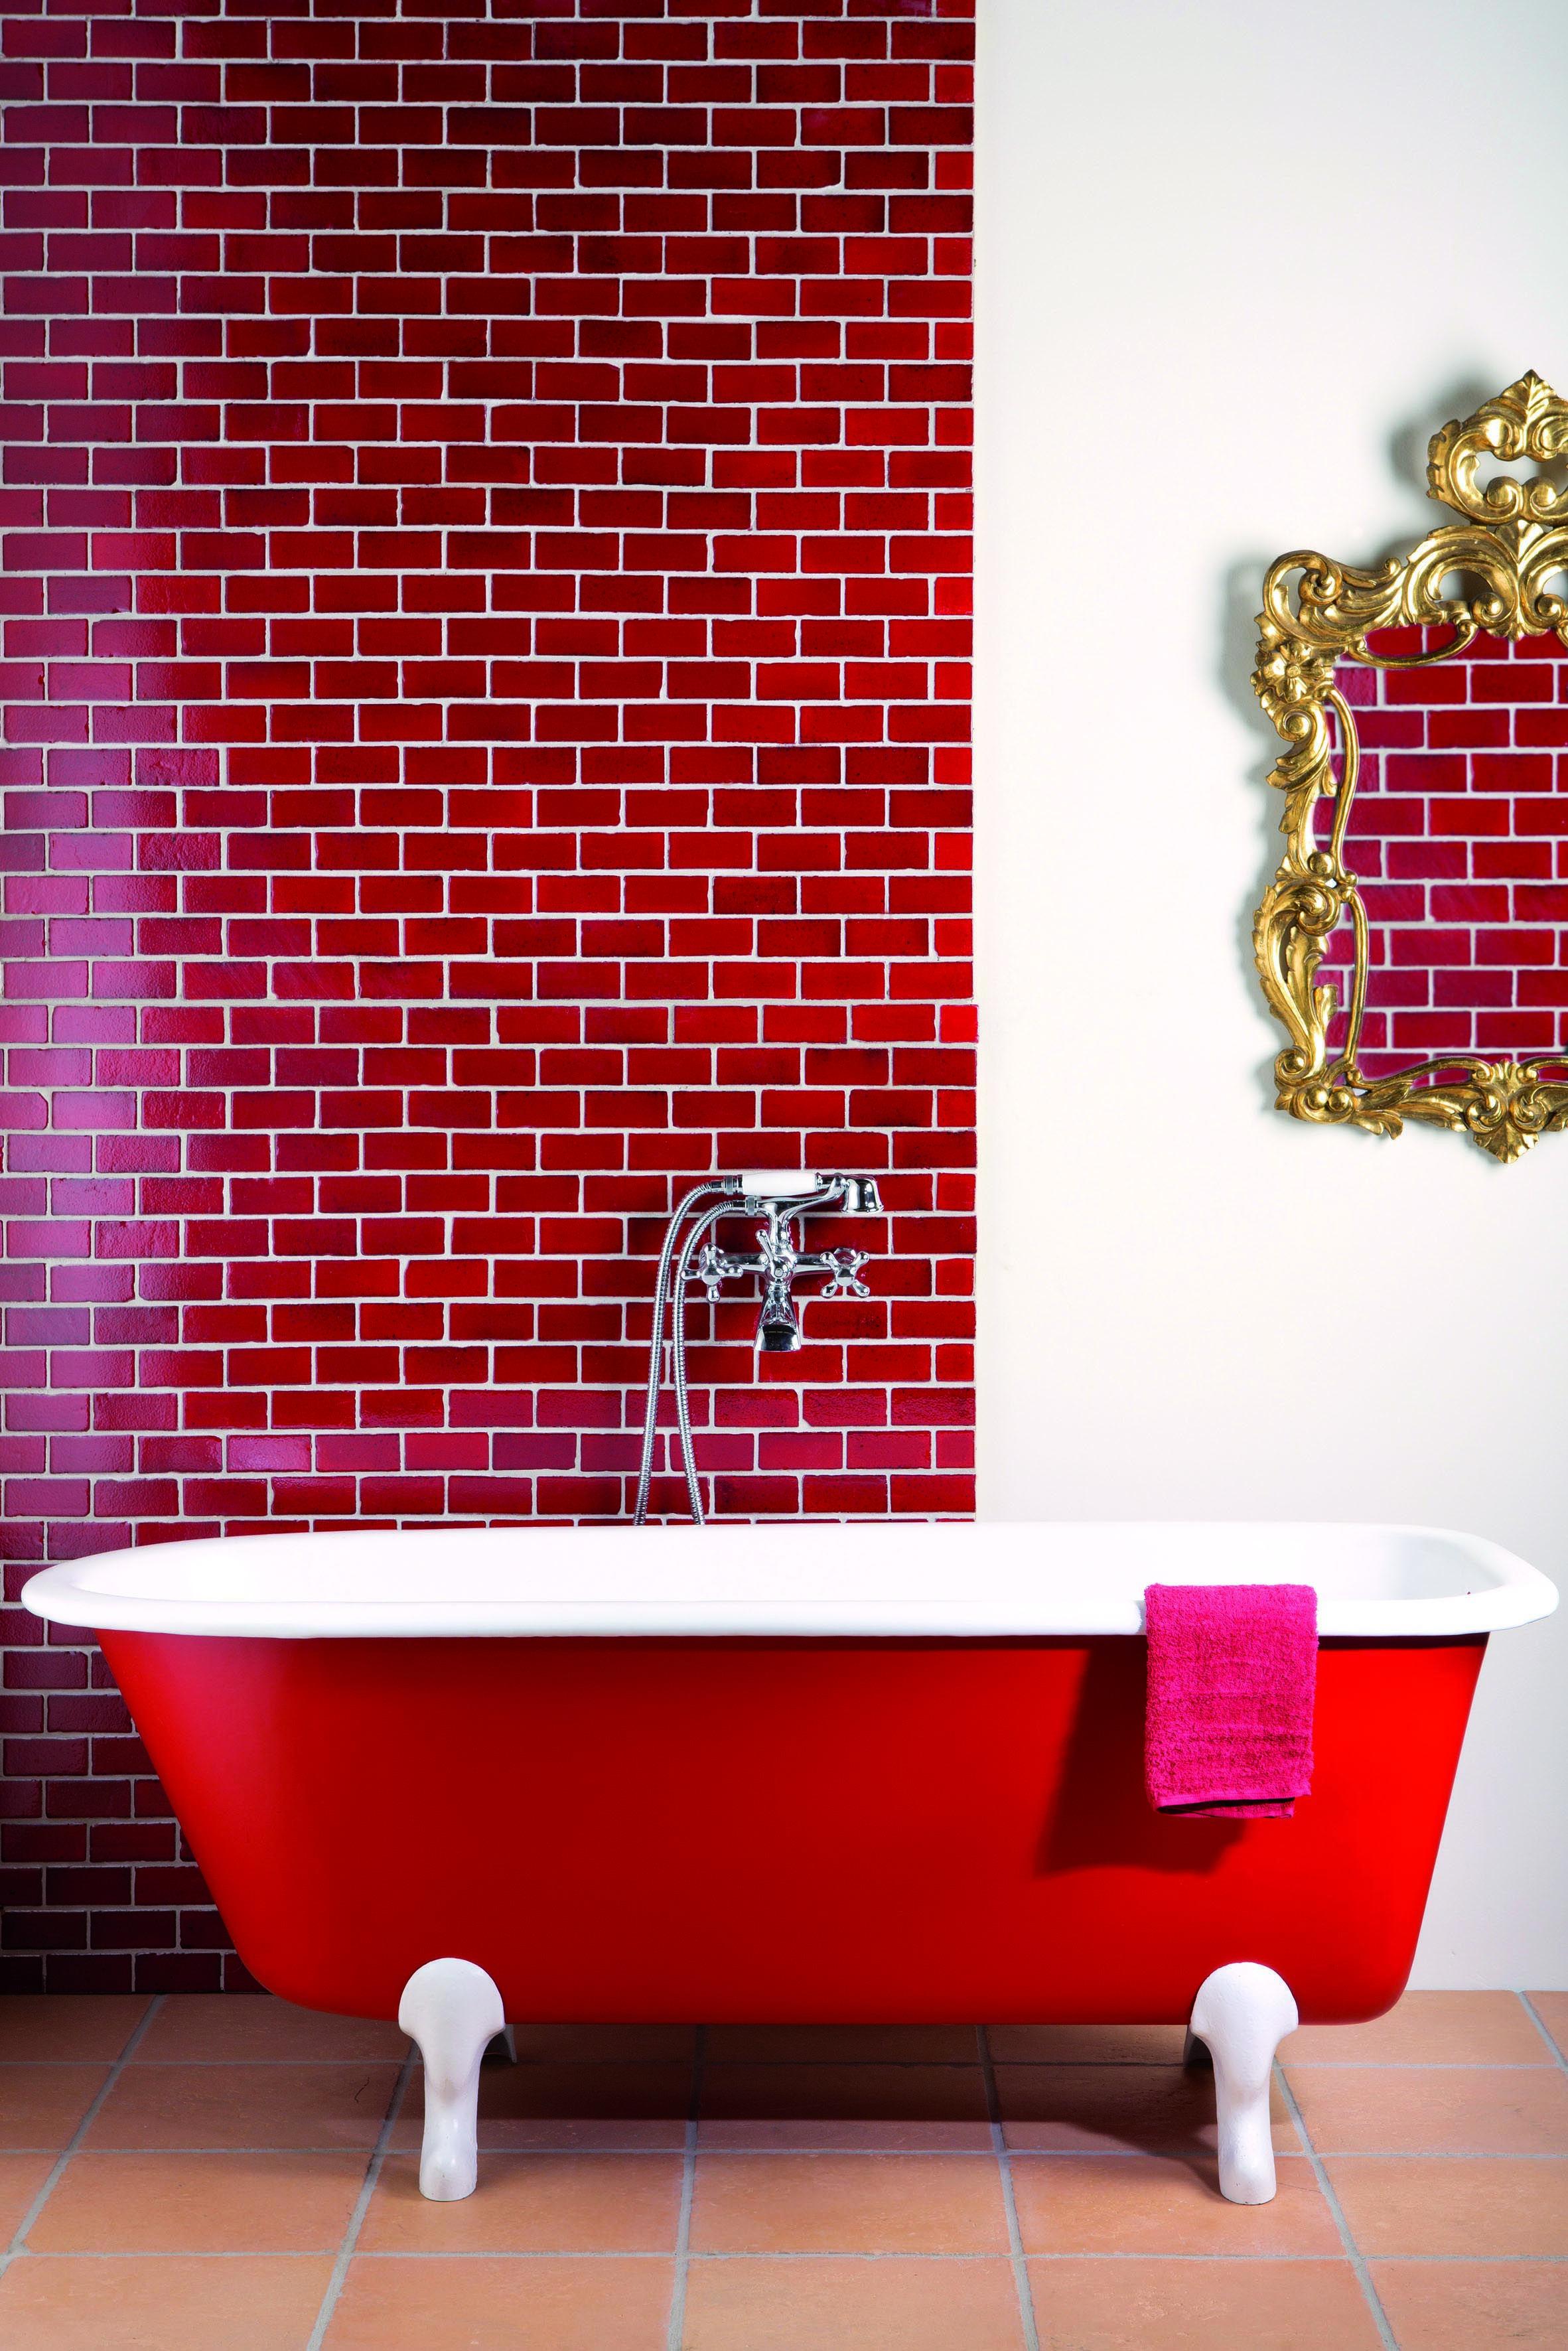 Design Trends Style With Tiles Bathroom Red Bathroom Tile Designs Red Interior Design